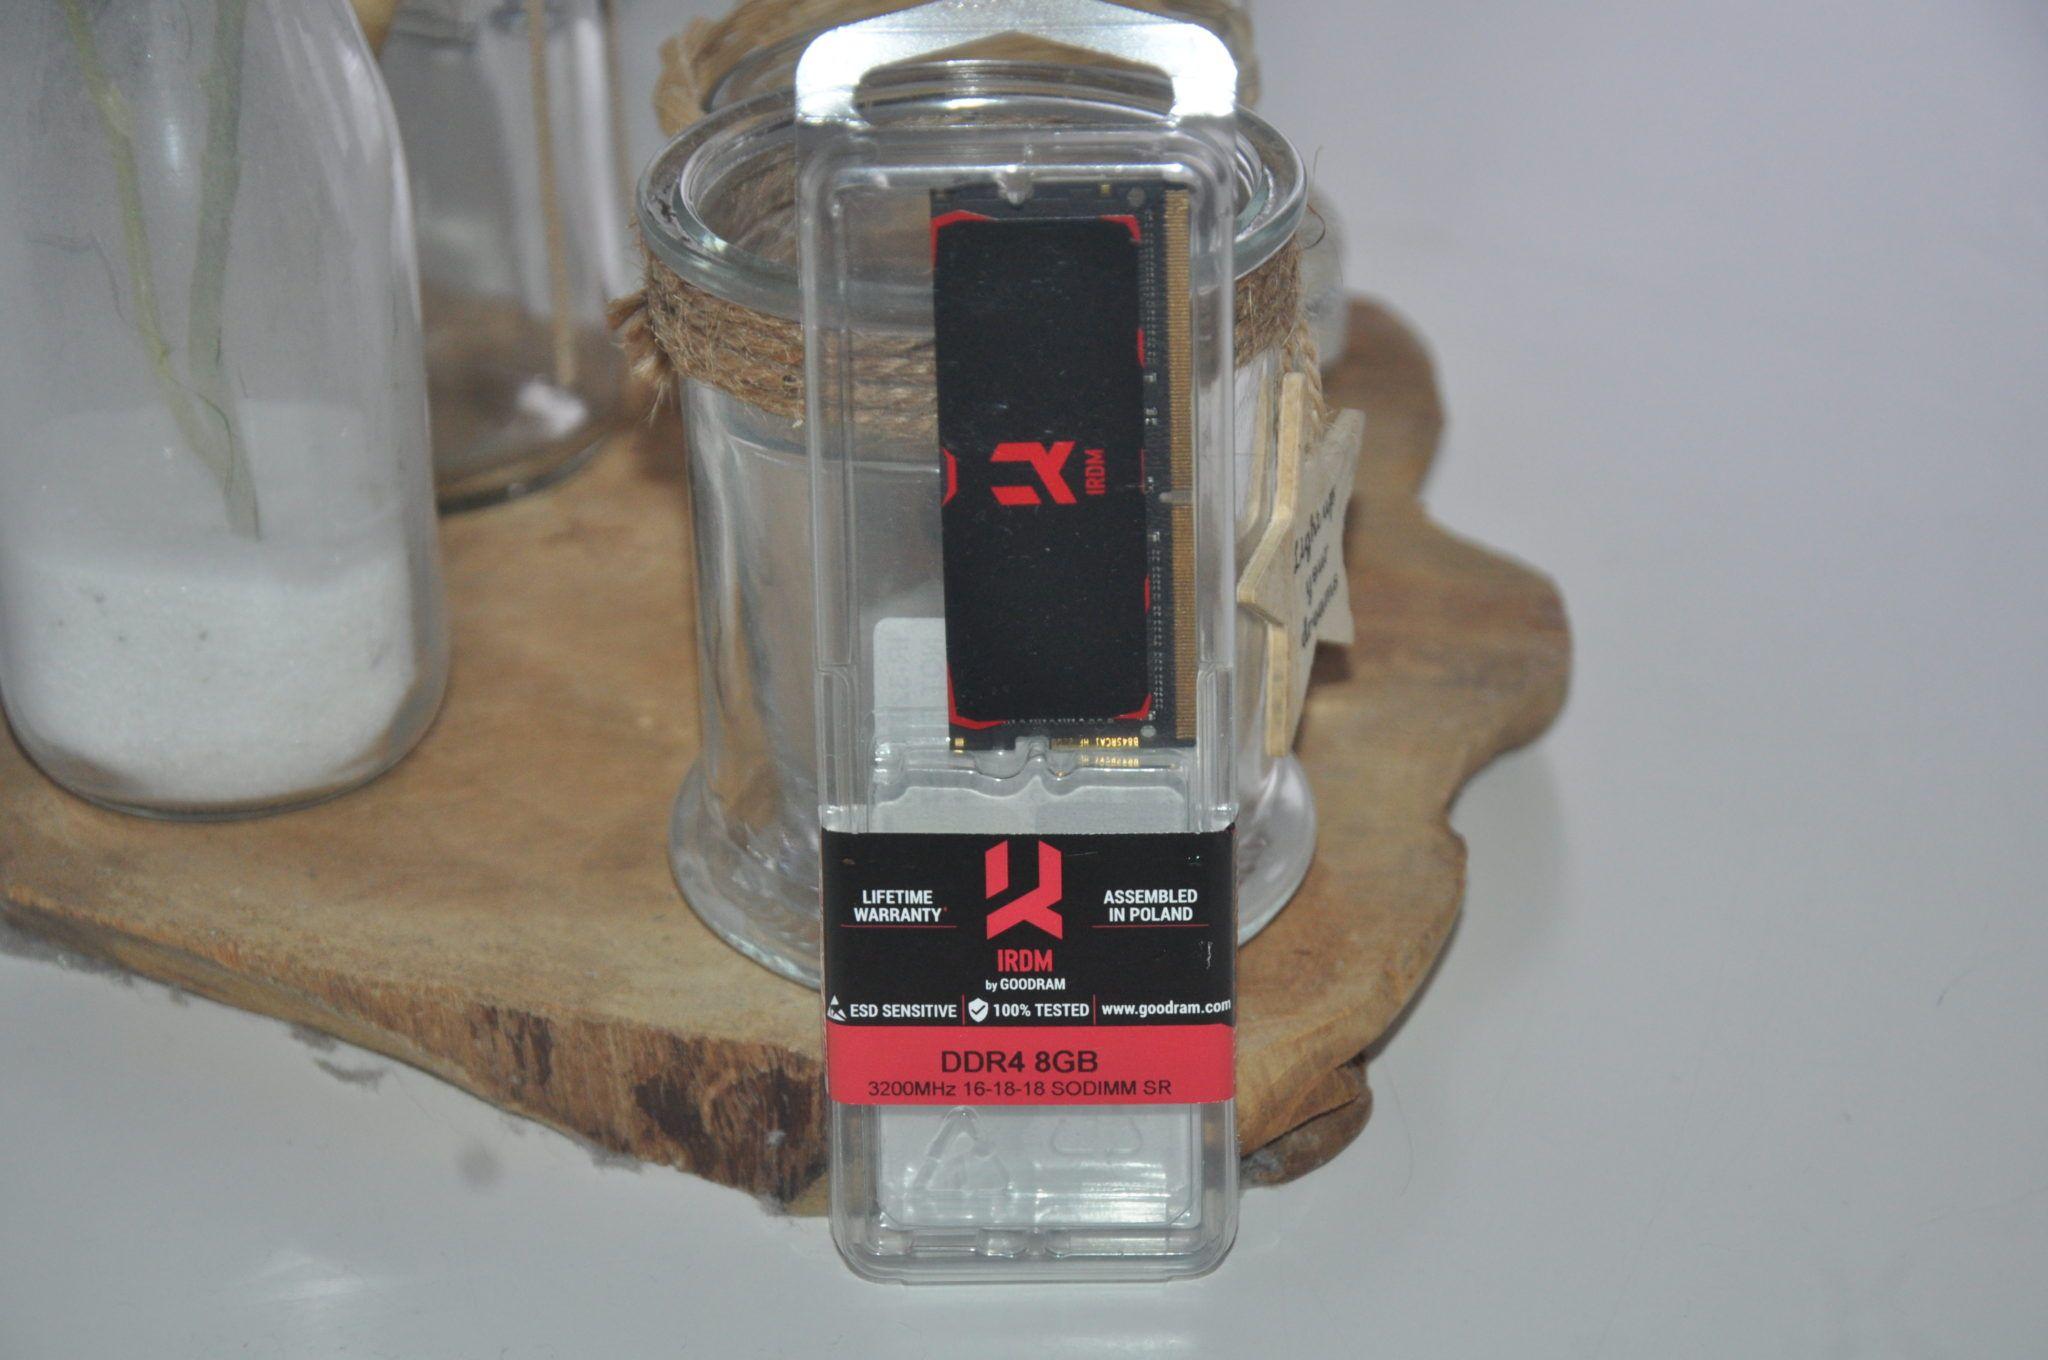 Review GoodRam IRDM DDR4 SODIMM 3200 Mhz 3